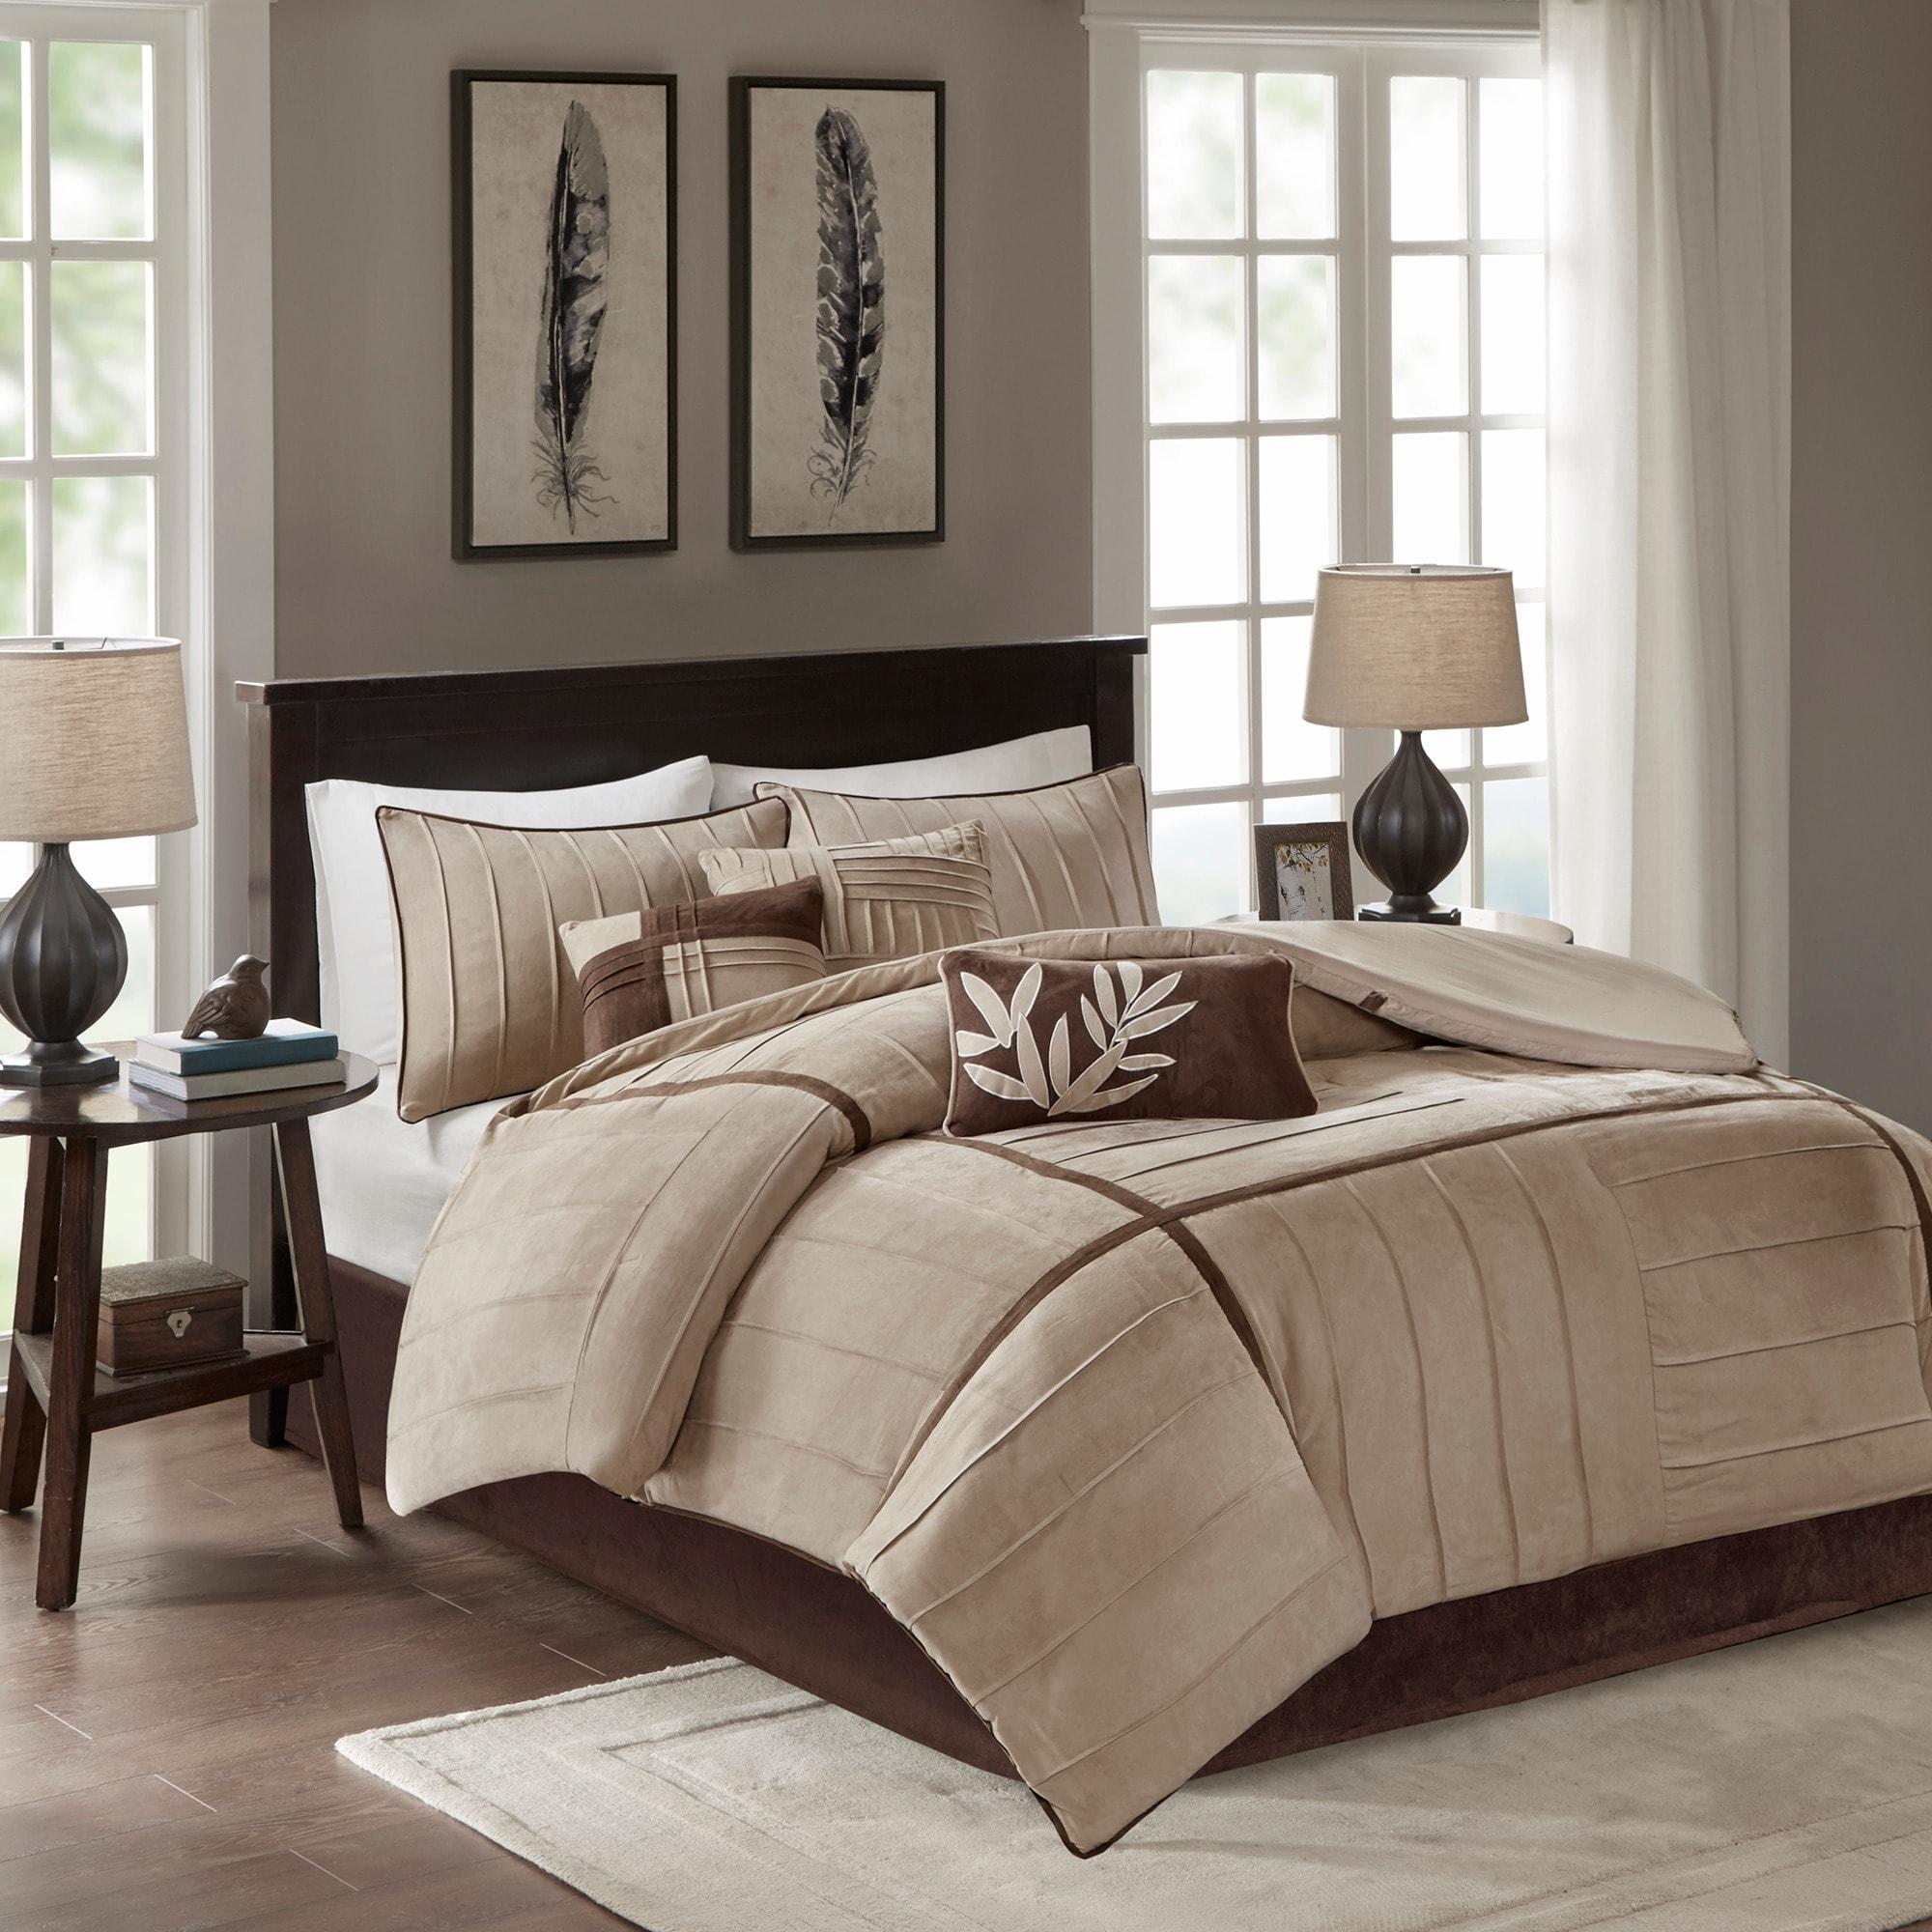 Madison Park Dune Beige 7 Piece Contemporary Comforter Set On Sale Overstock 5480035